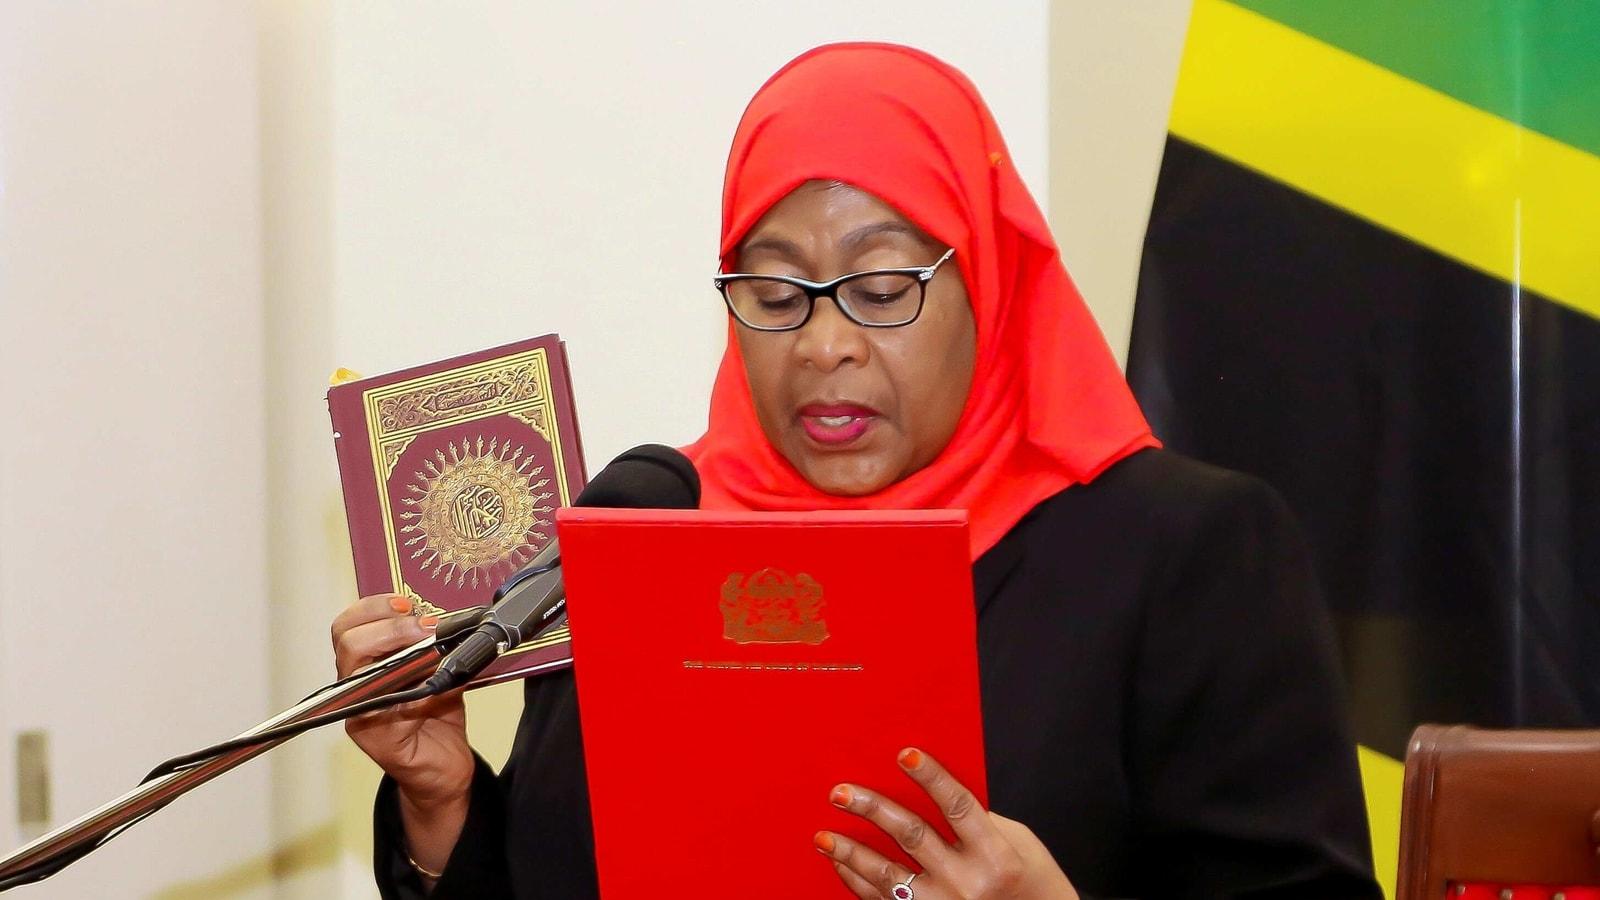 US vice president Harris congratulates Tanzania's first woman president Hassan